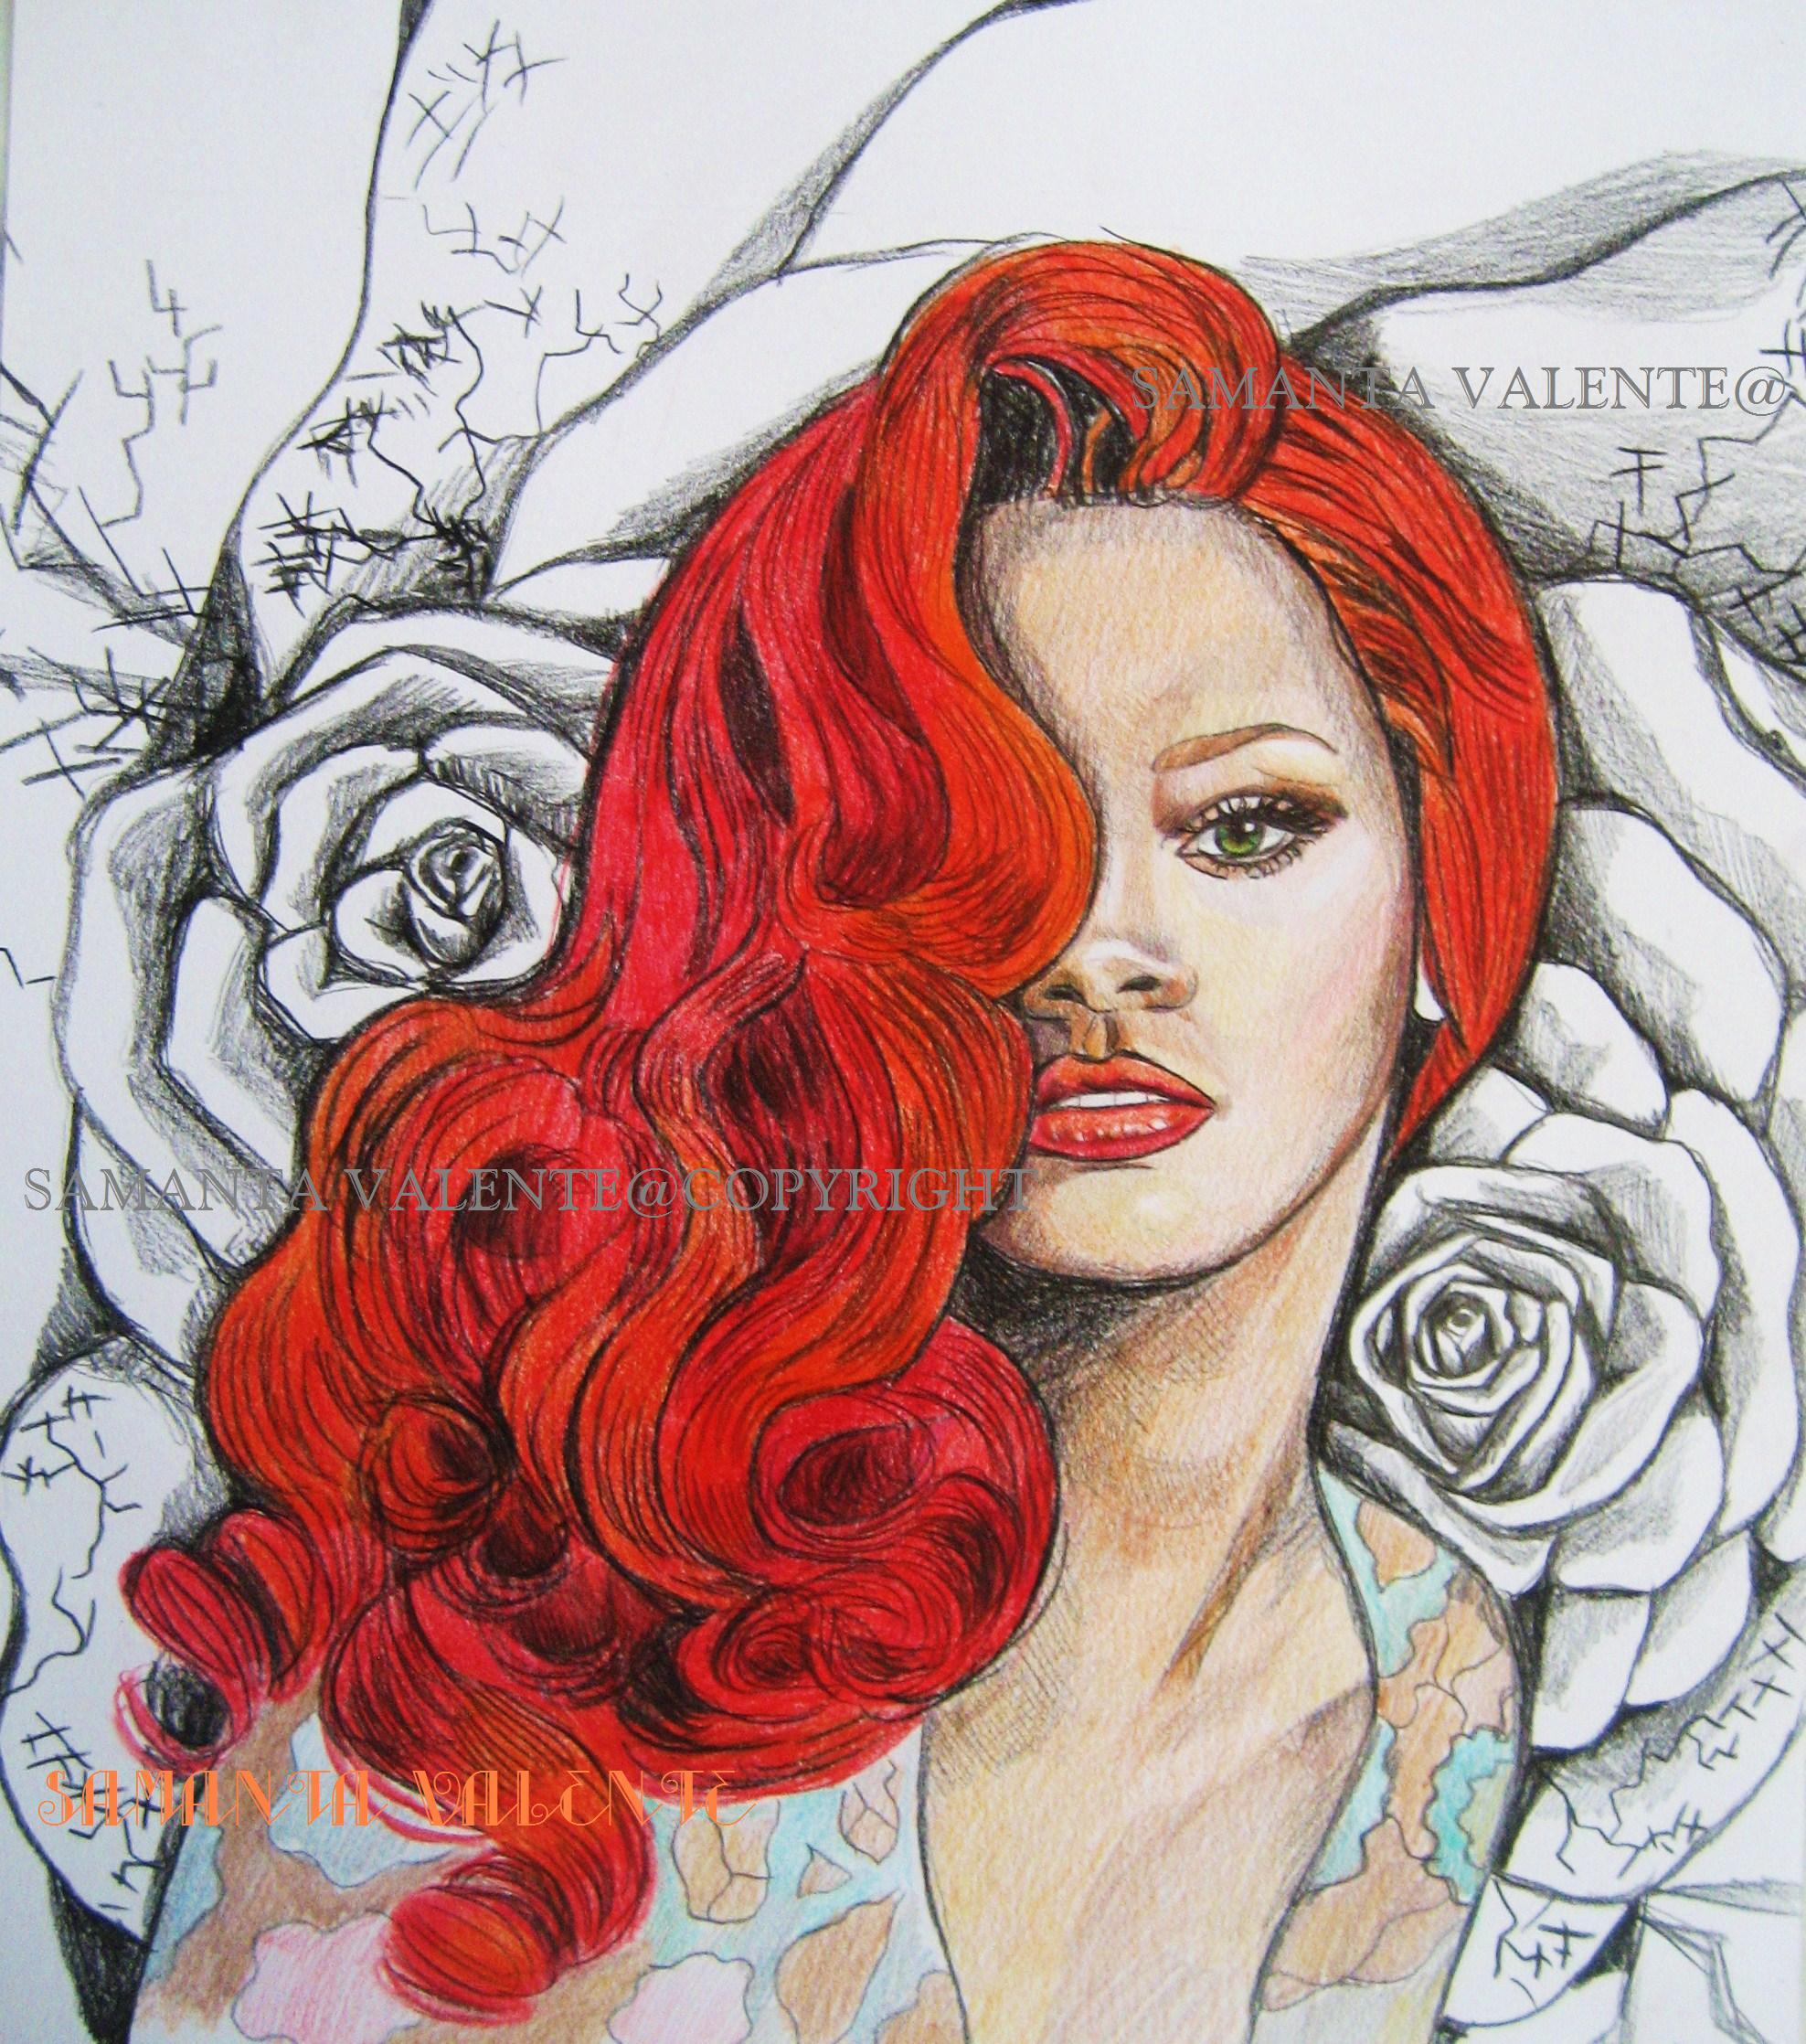 Rihannafrom The Series Celebrity Samanta Valente Opera